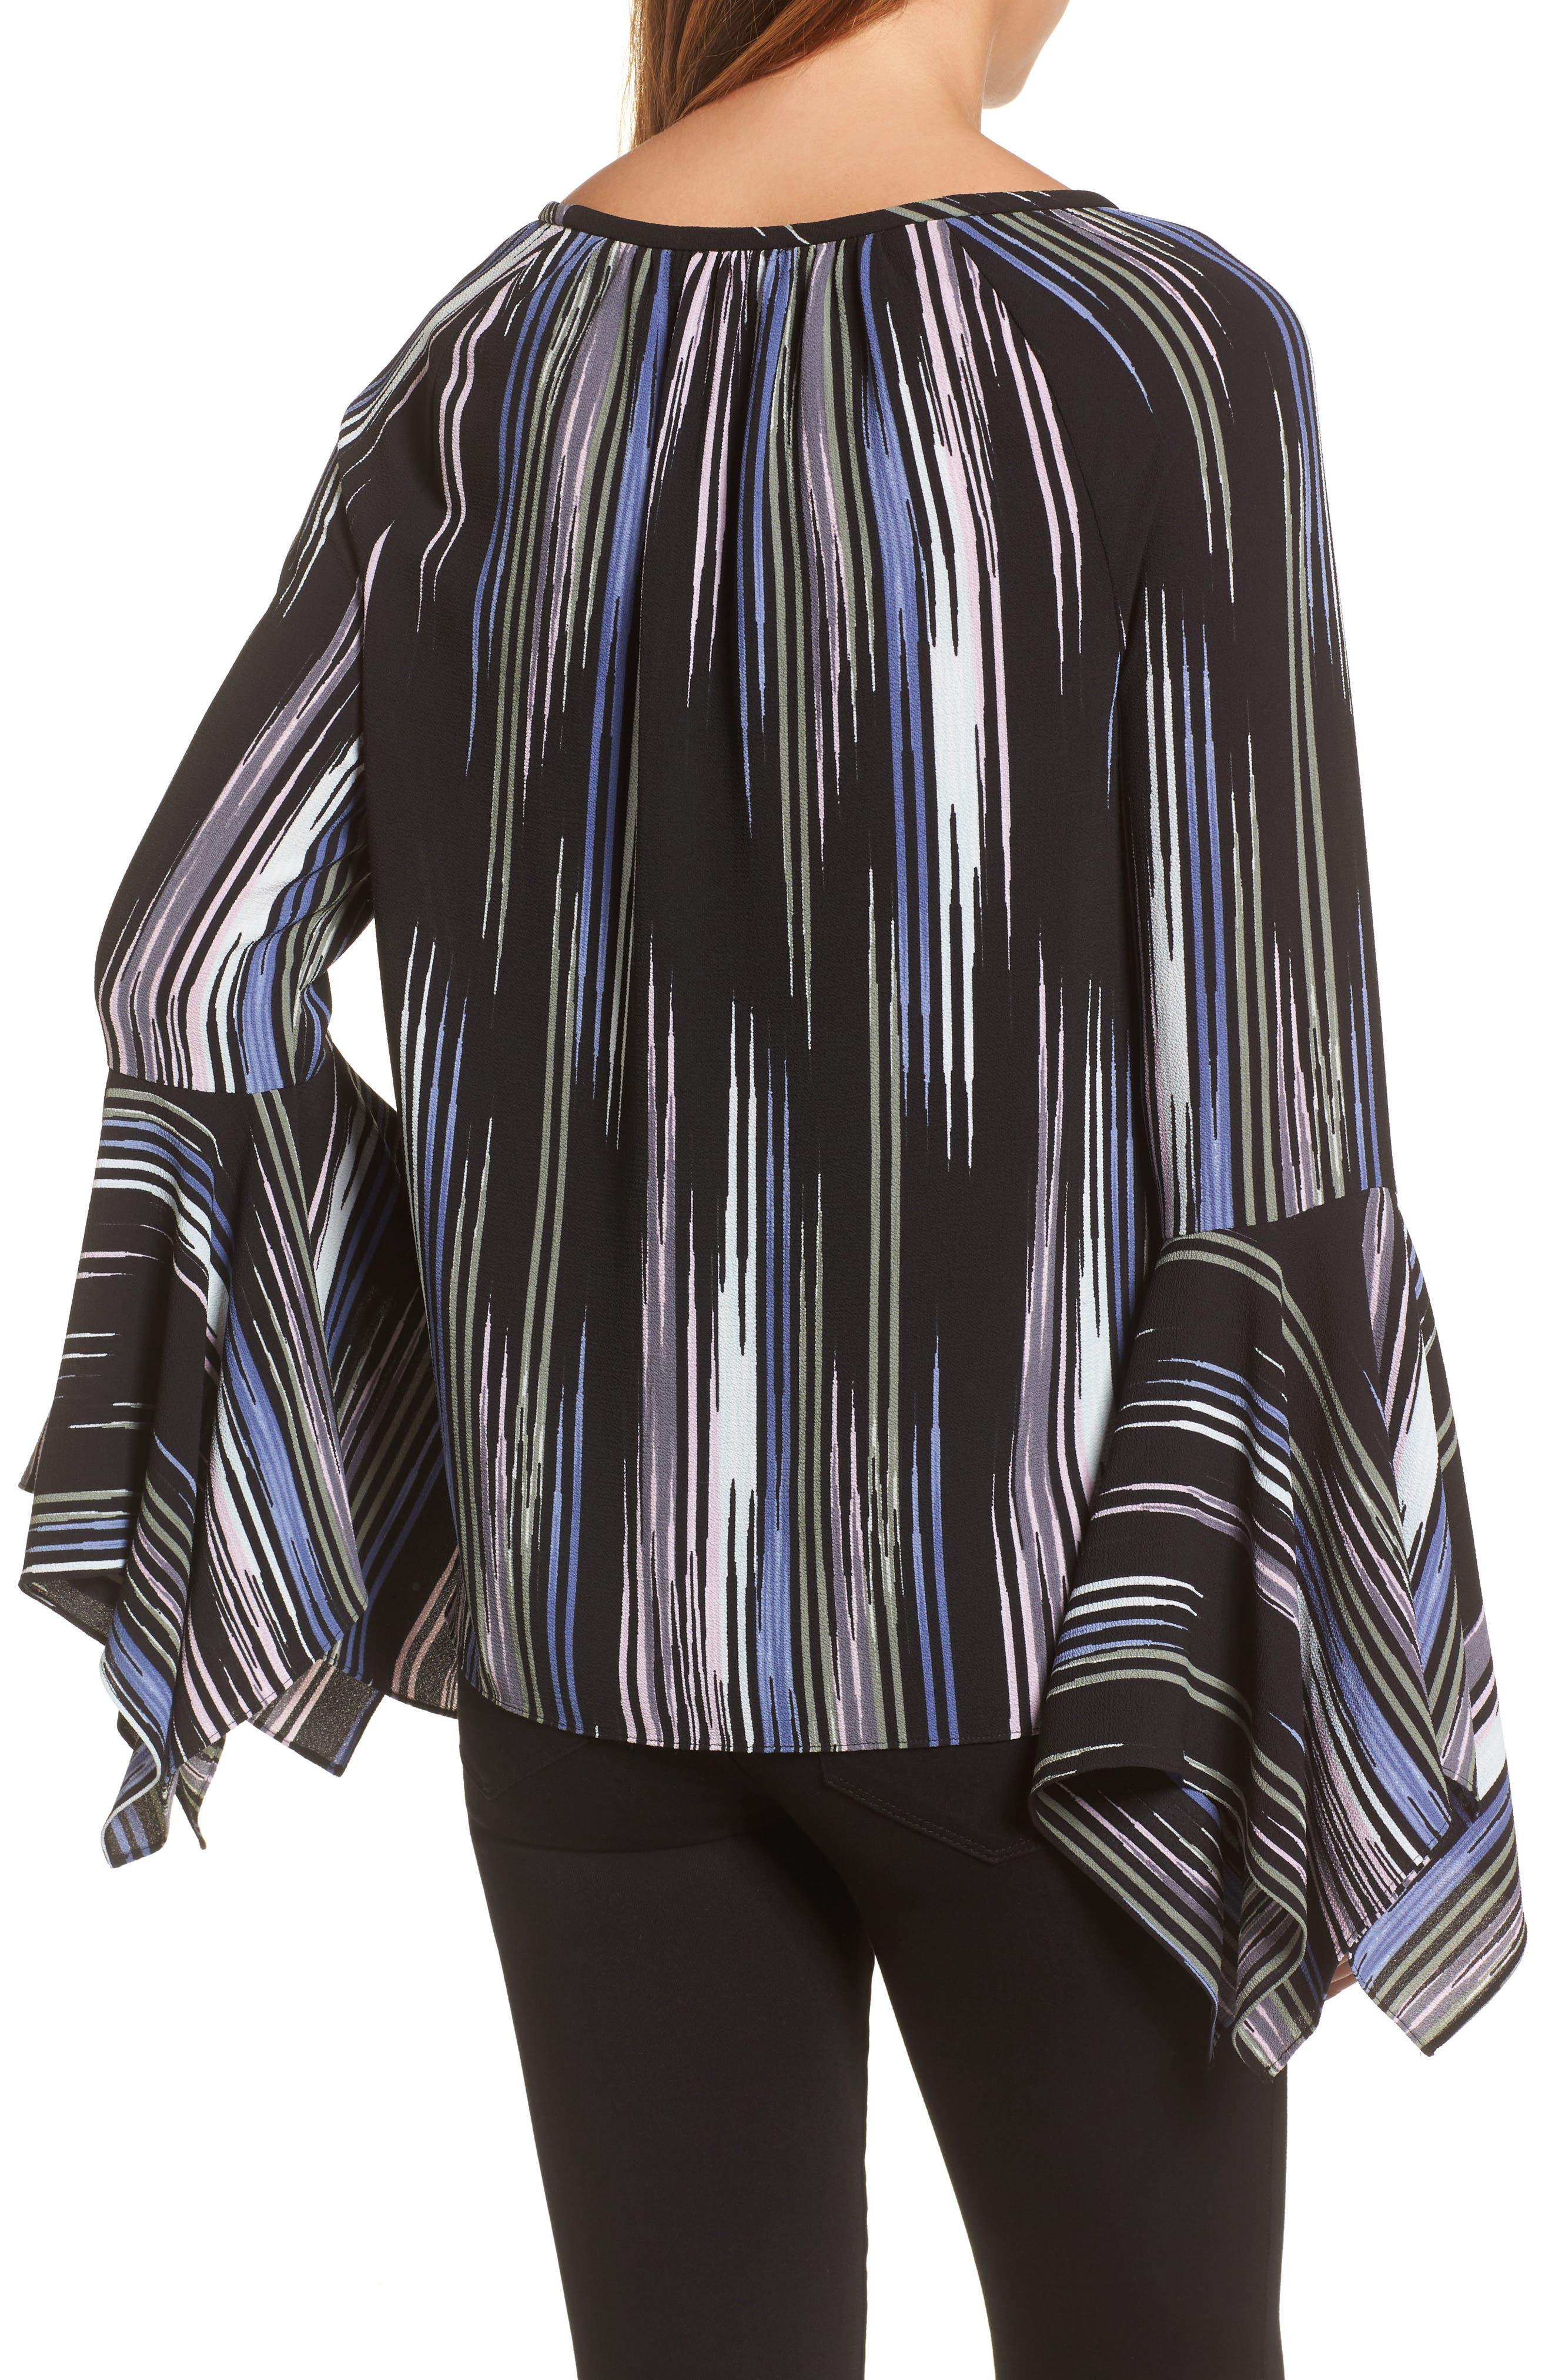 Alternate Image 2  - Vince Camuto Colorful Peaks Handkerchief Sleeve Top